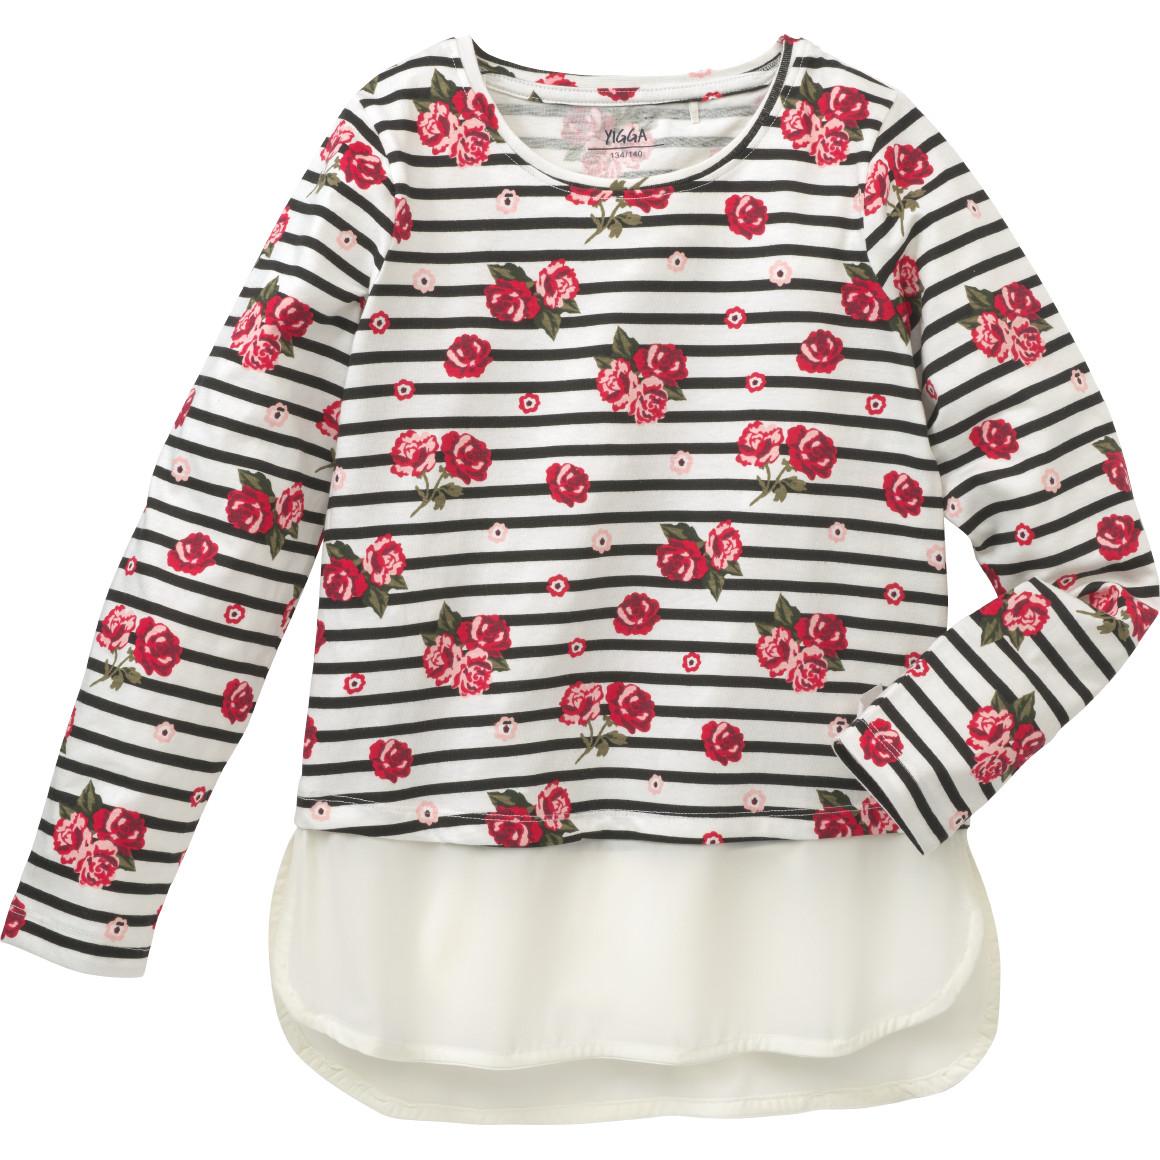 Mädchen Langarmshirt mit Rosen Print